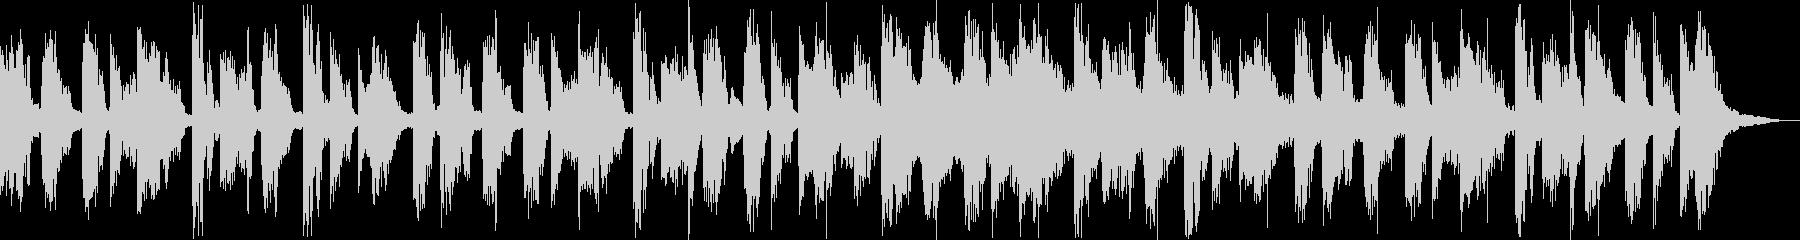 【CM】クールなエレクトロBGM・12の未再生の波形